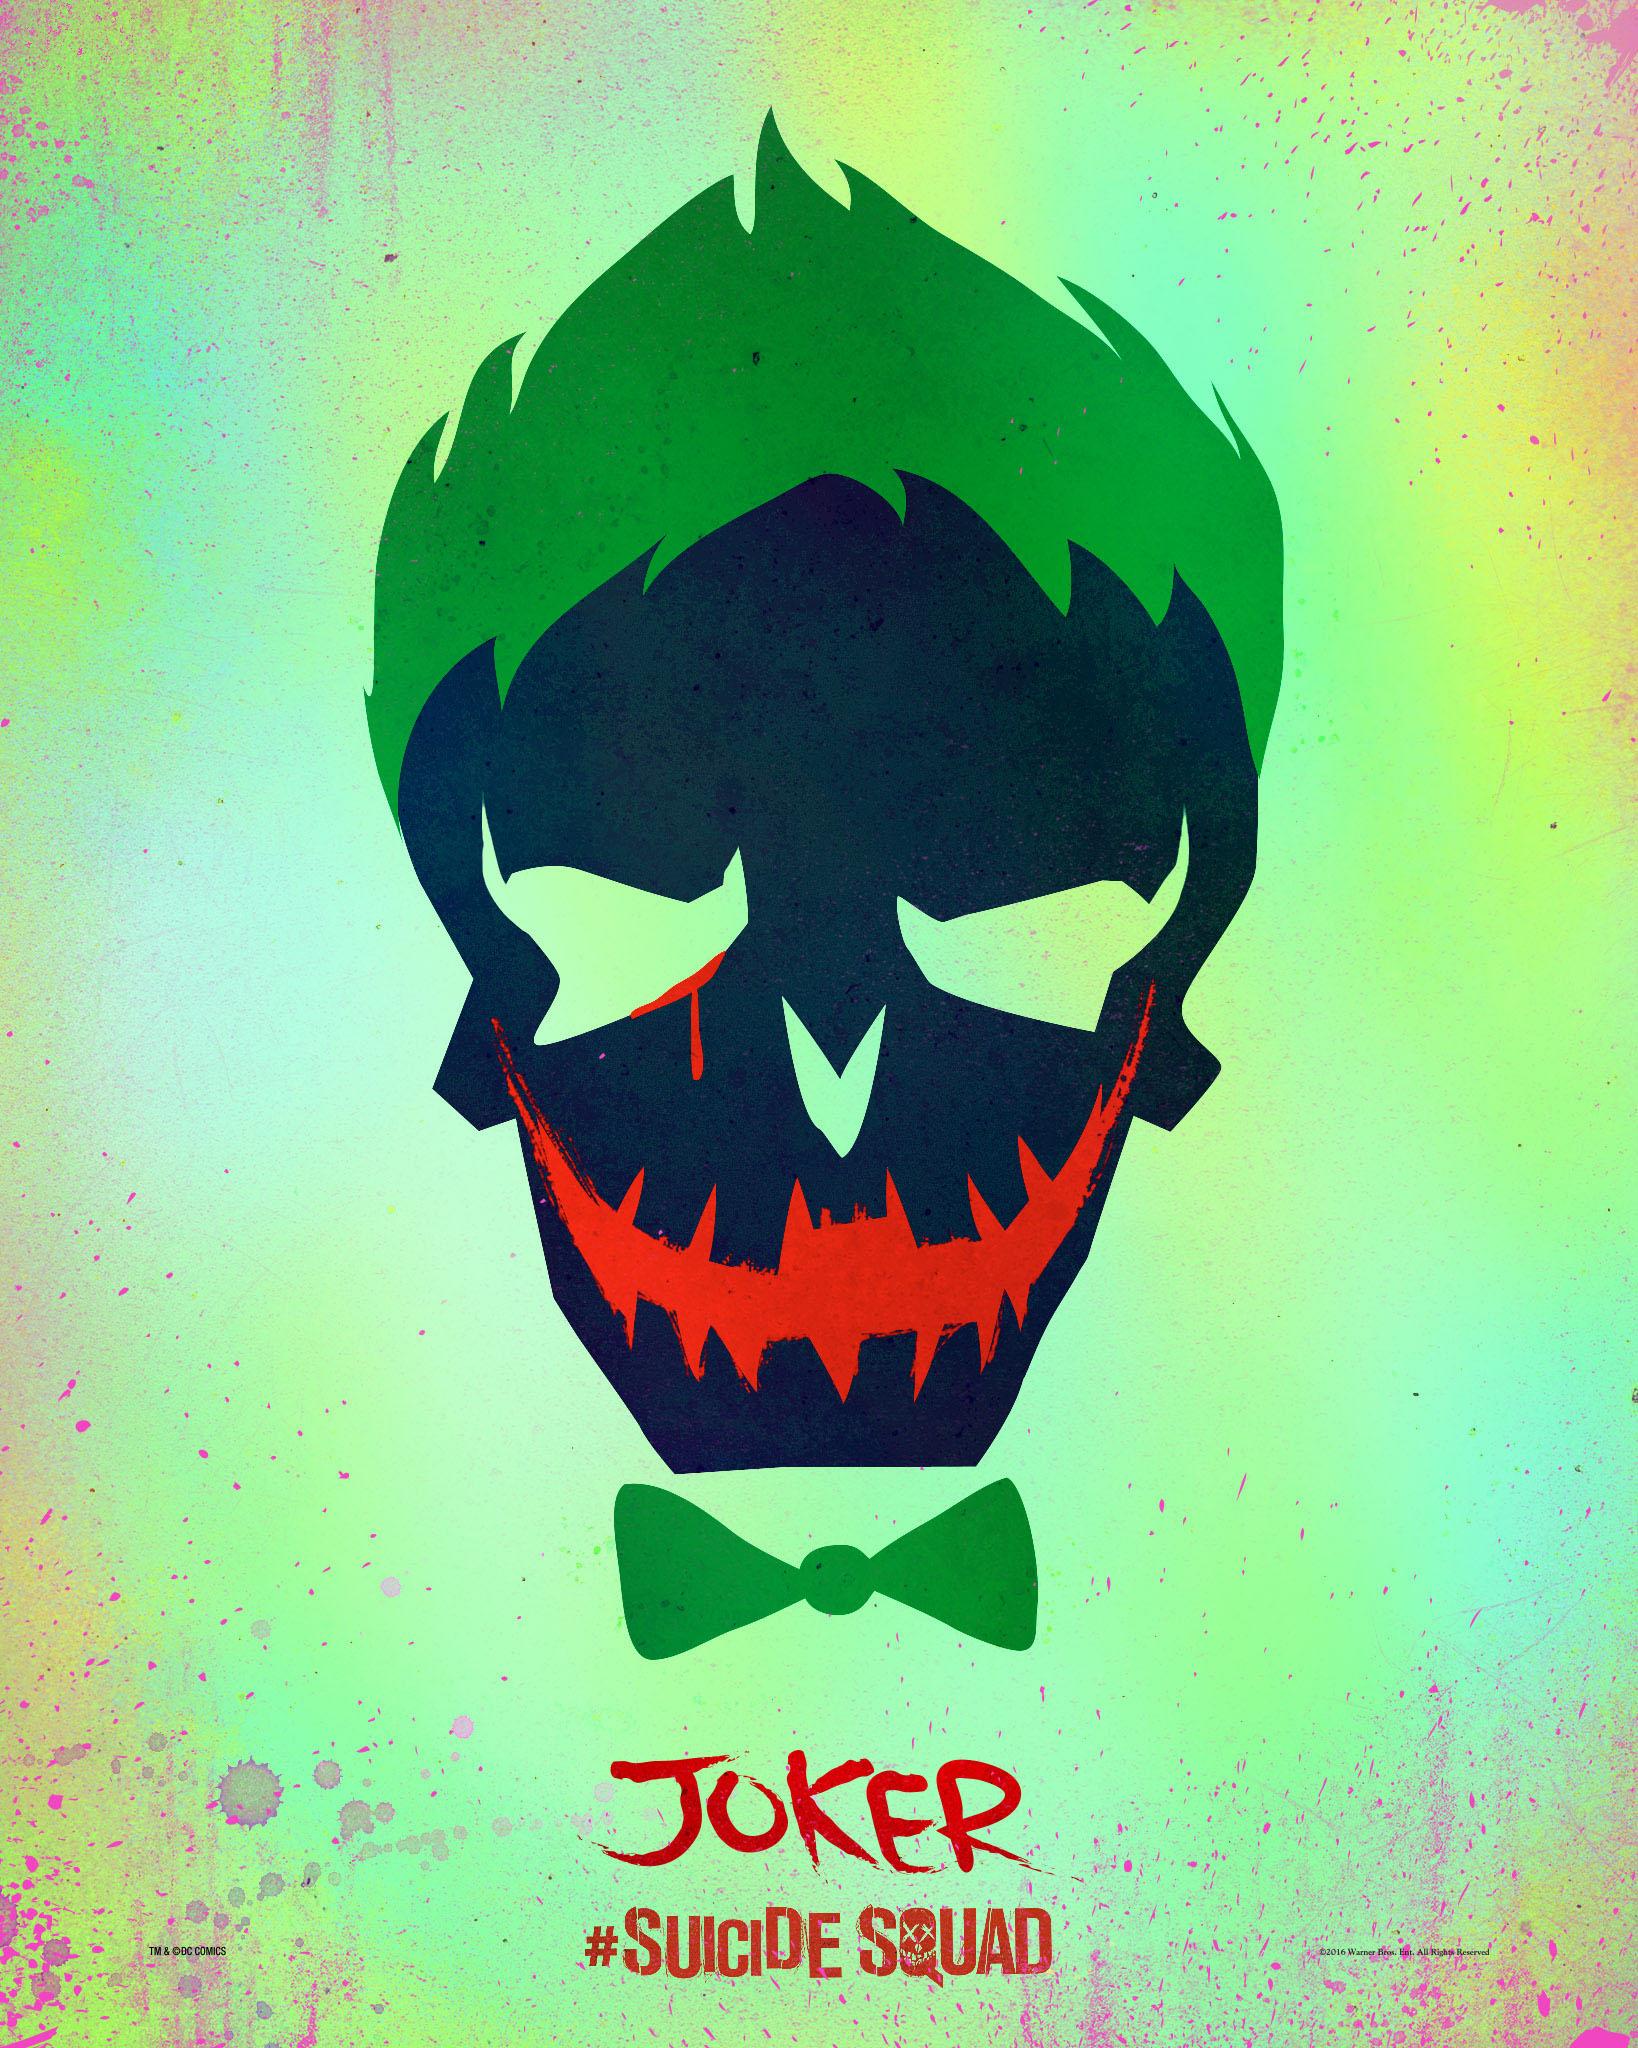 SUISQ_Skull_Joker_Instagram_1638x2048_master